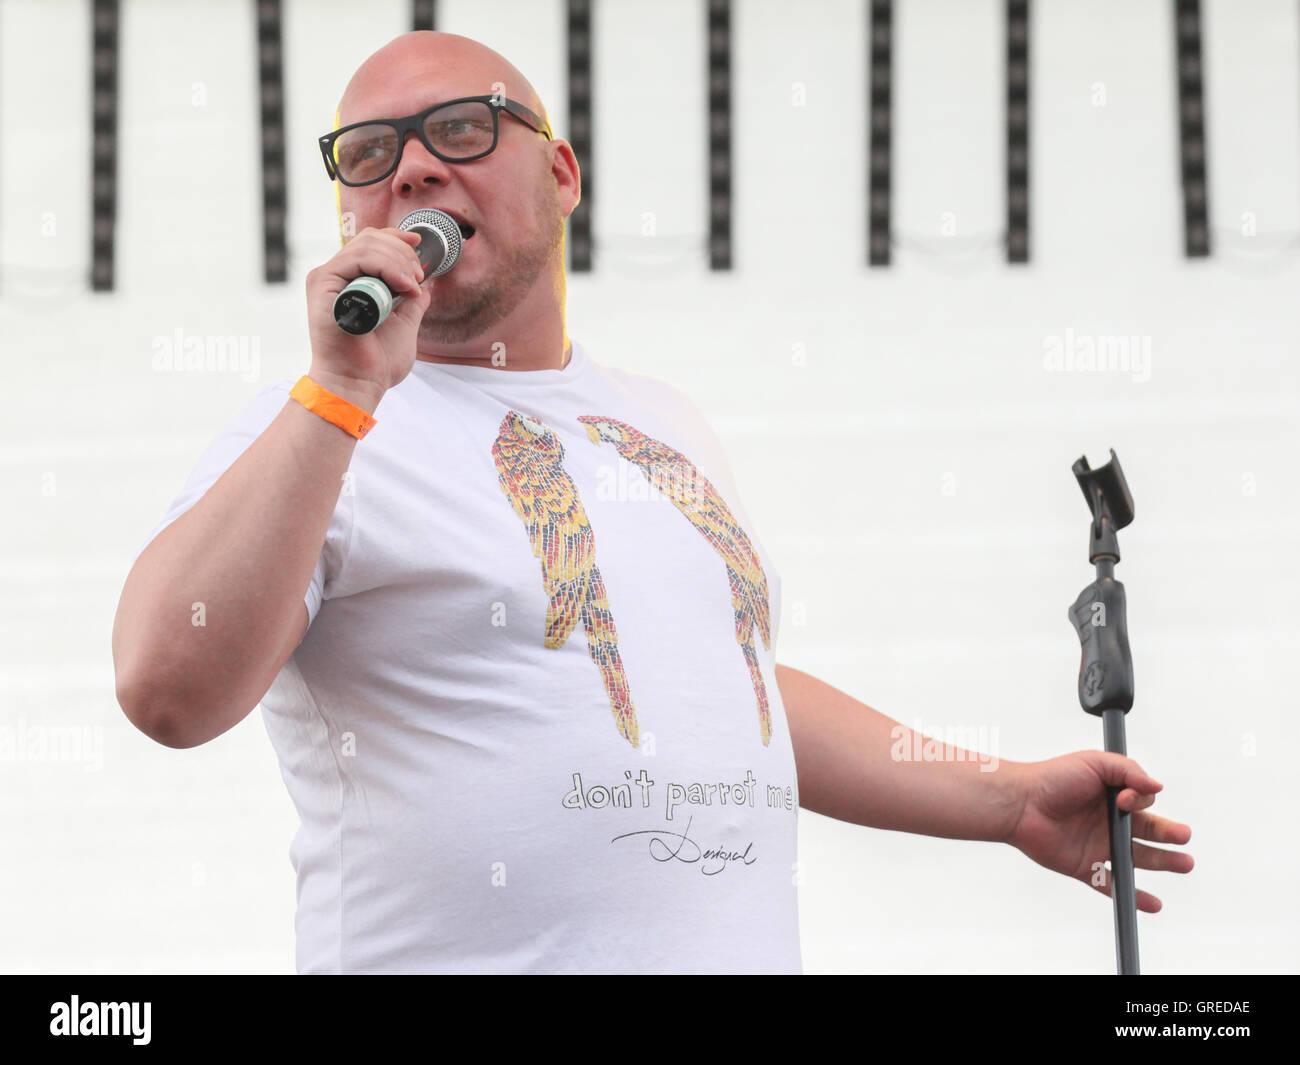 Singer Buddy - Stock Image